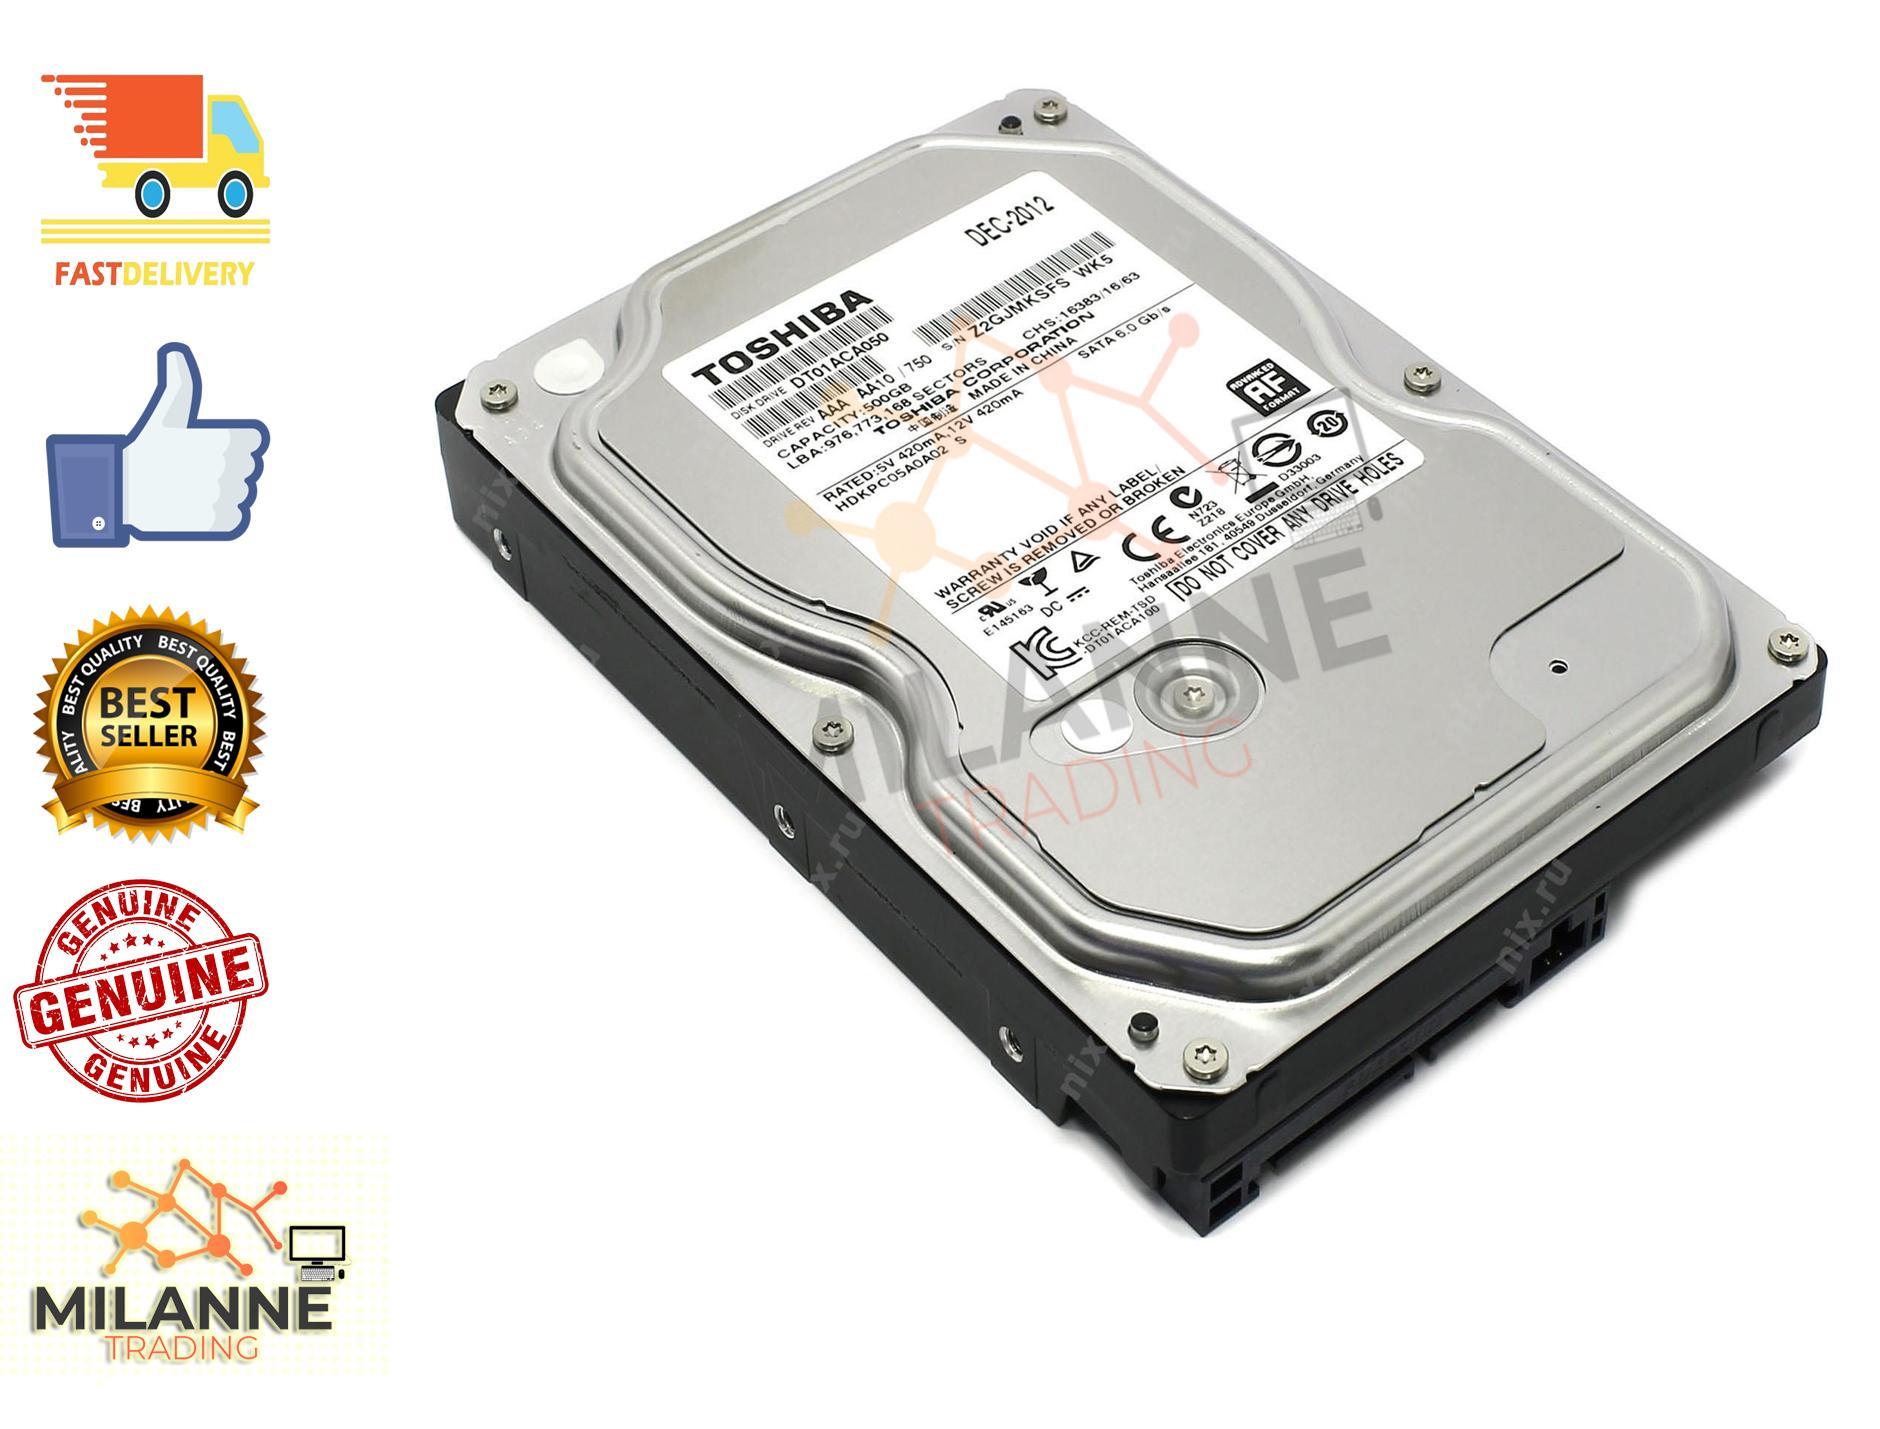 New Driver: Compaq 620 Notebook Western Digital HDD